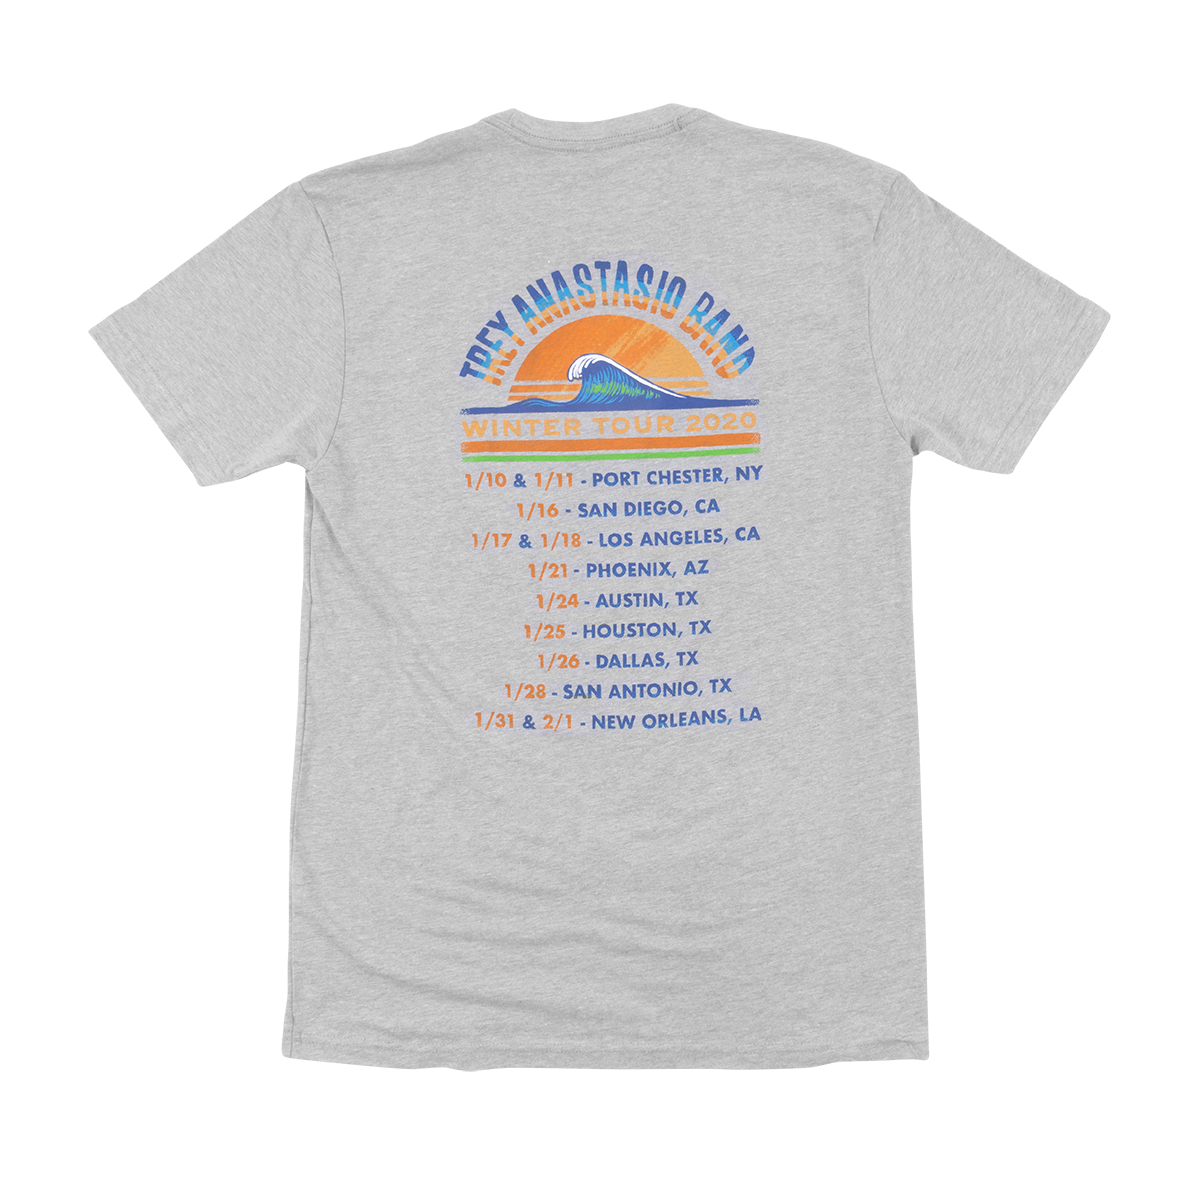 Trey Anastasio Band Men's Pacific Surf Tee